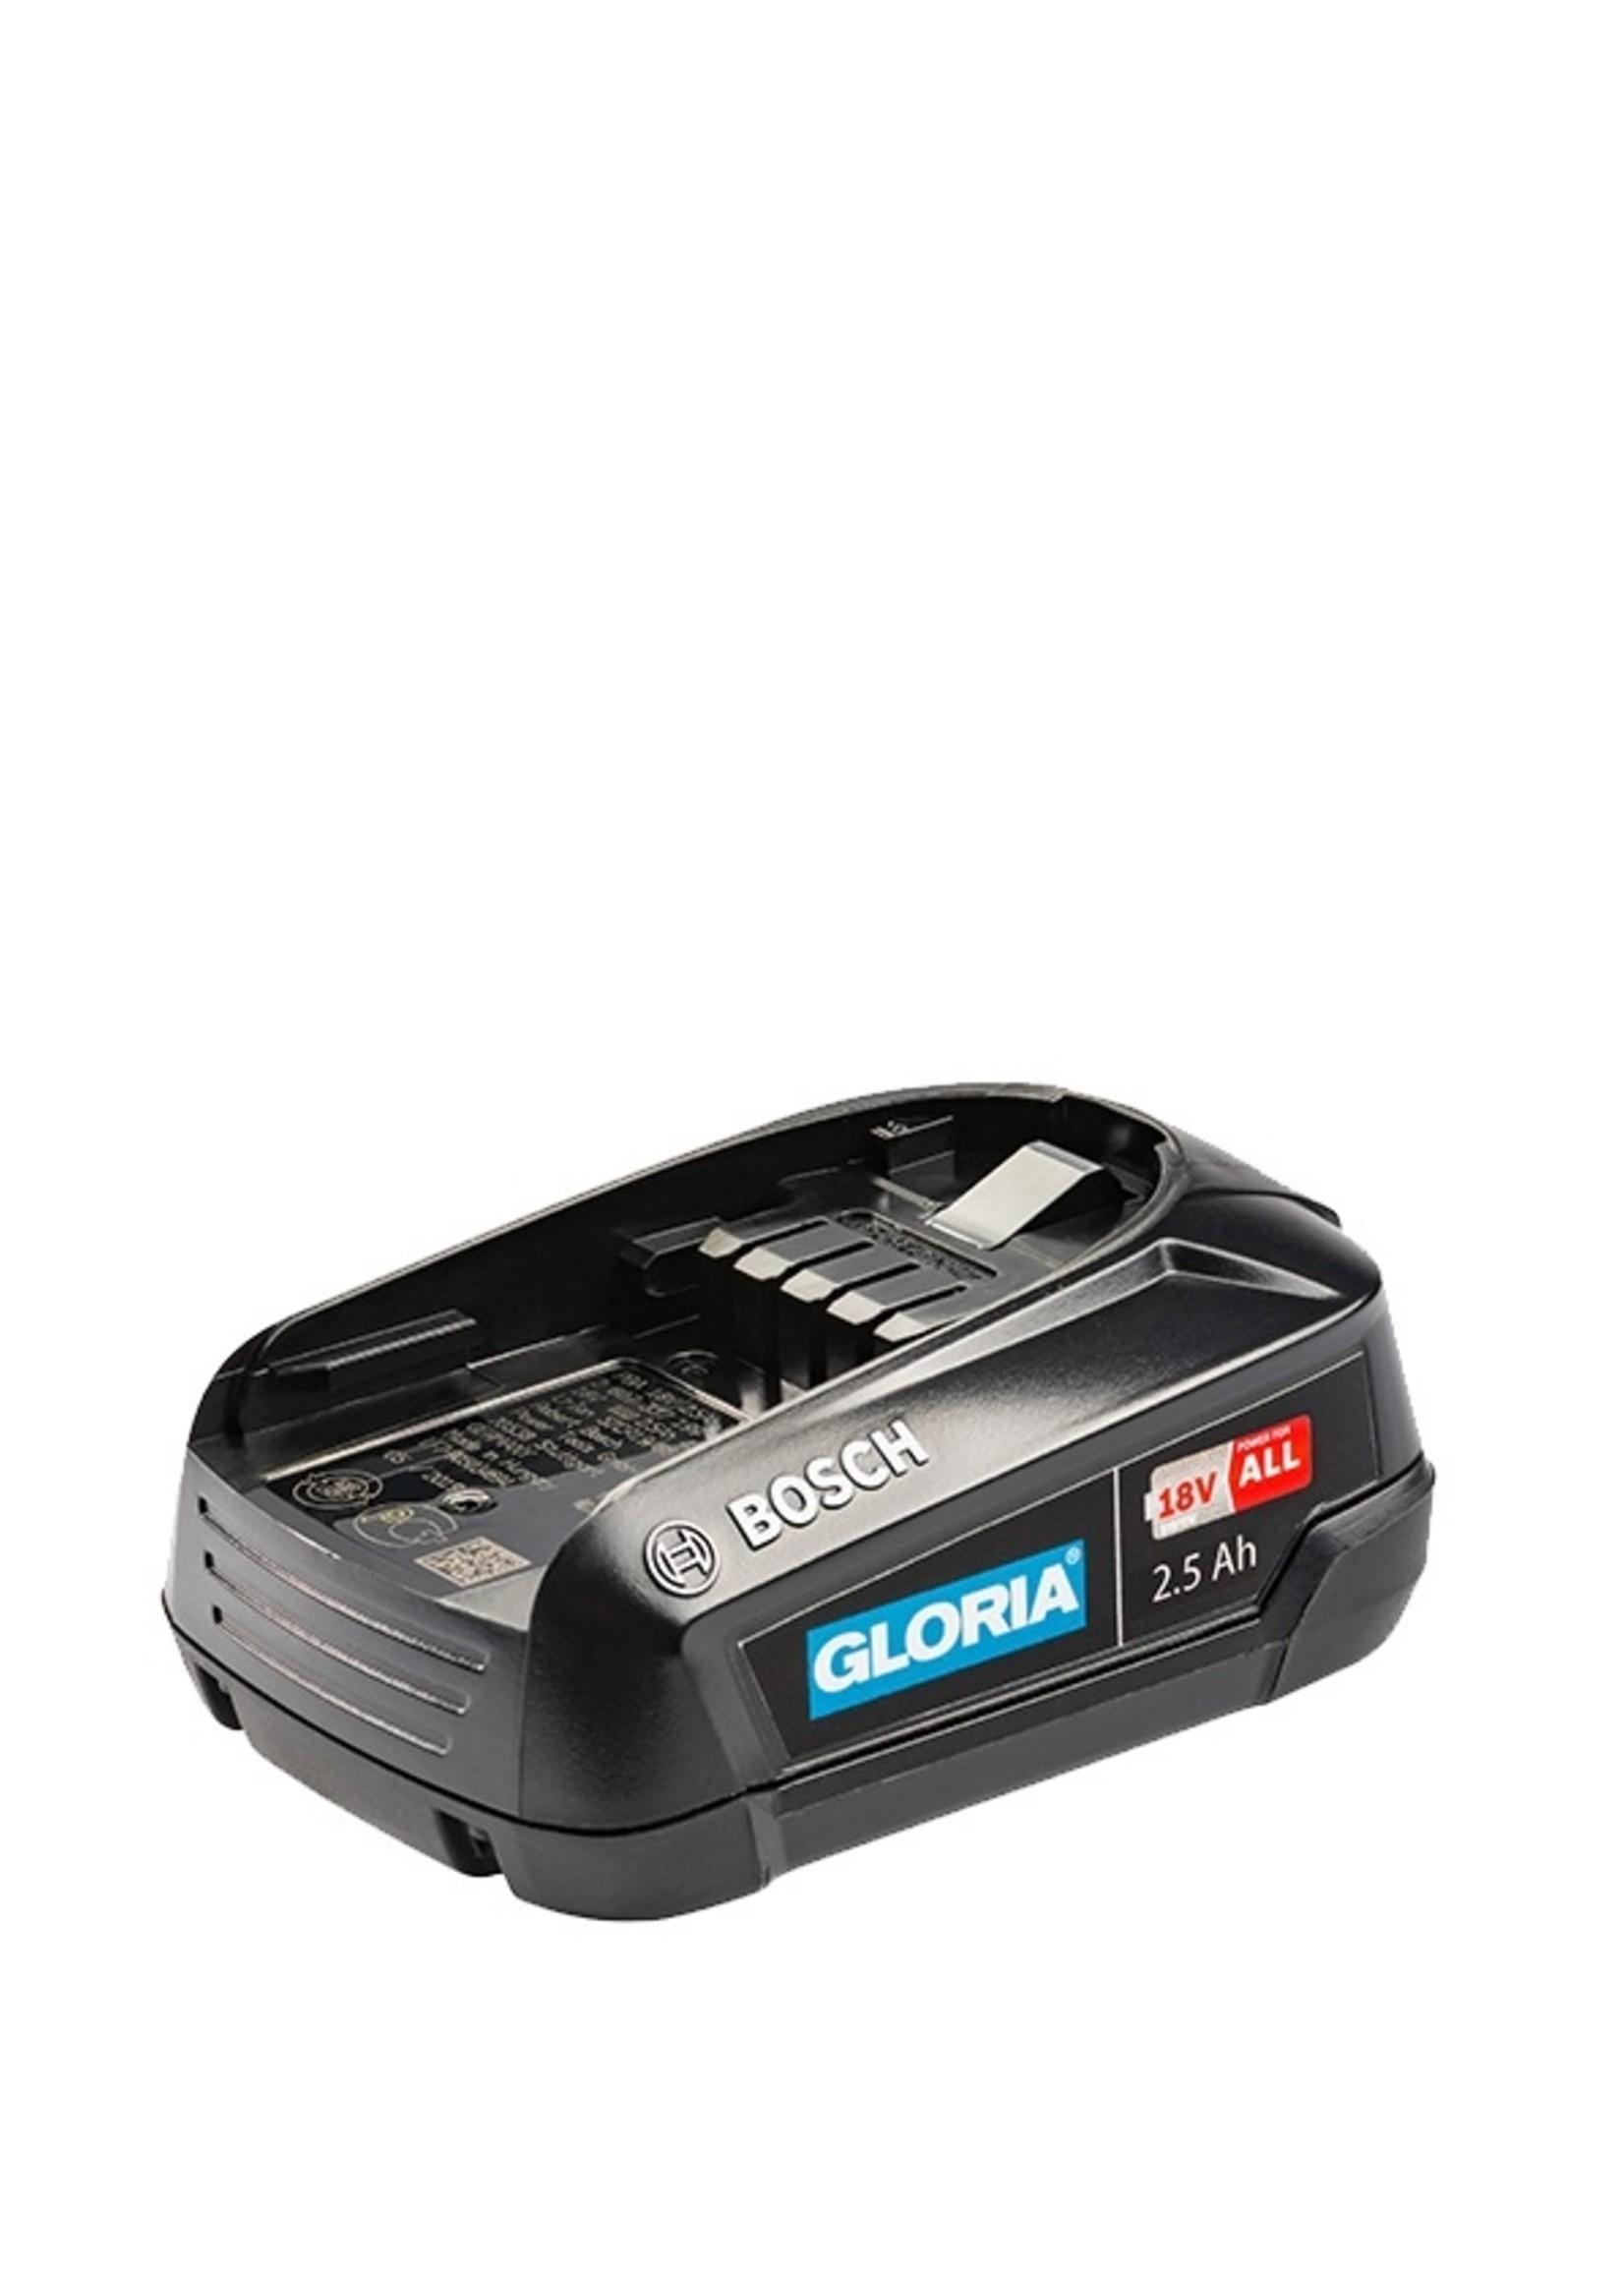 Gloria Accu 2,5 Ah oplaadbare accu met BOSCH Power